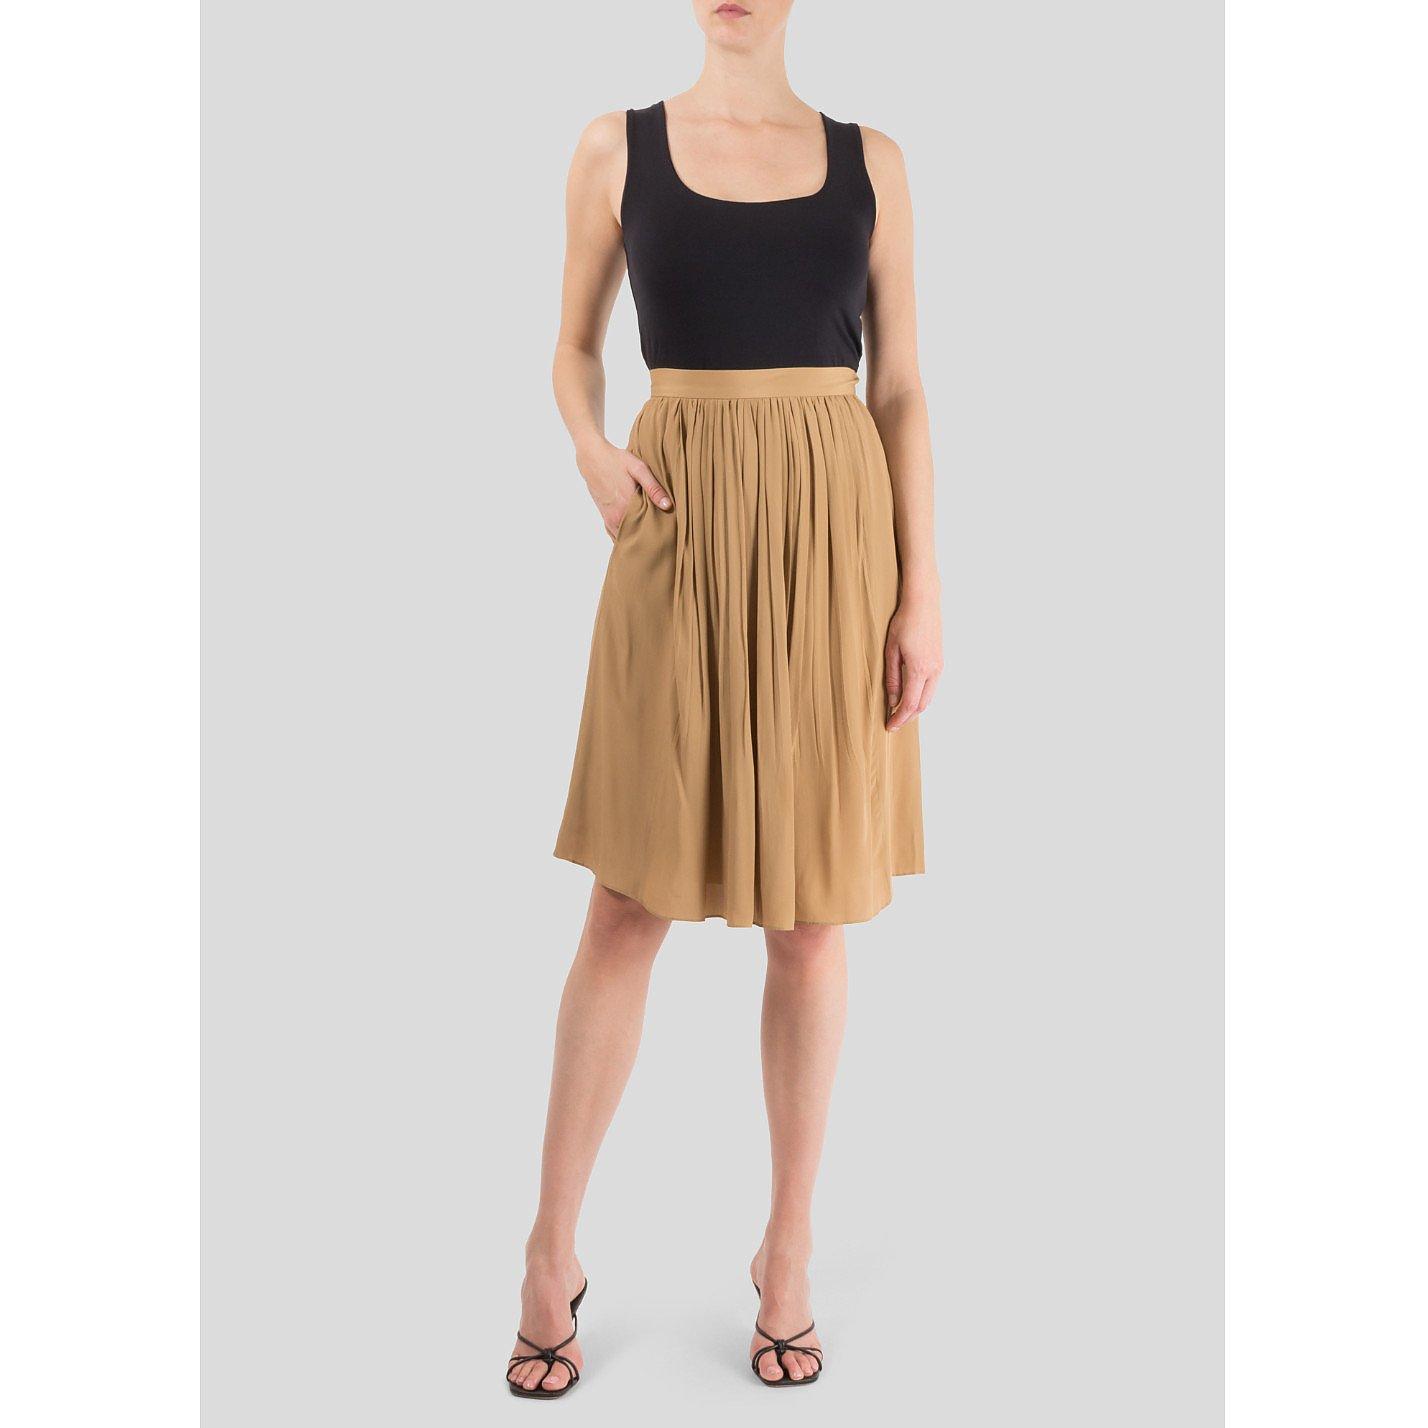 Chloé Silk Skirt